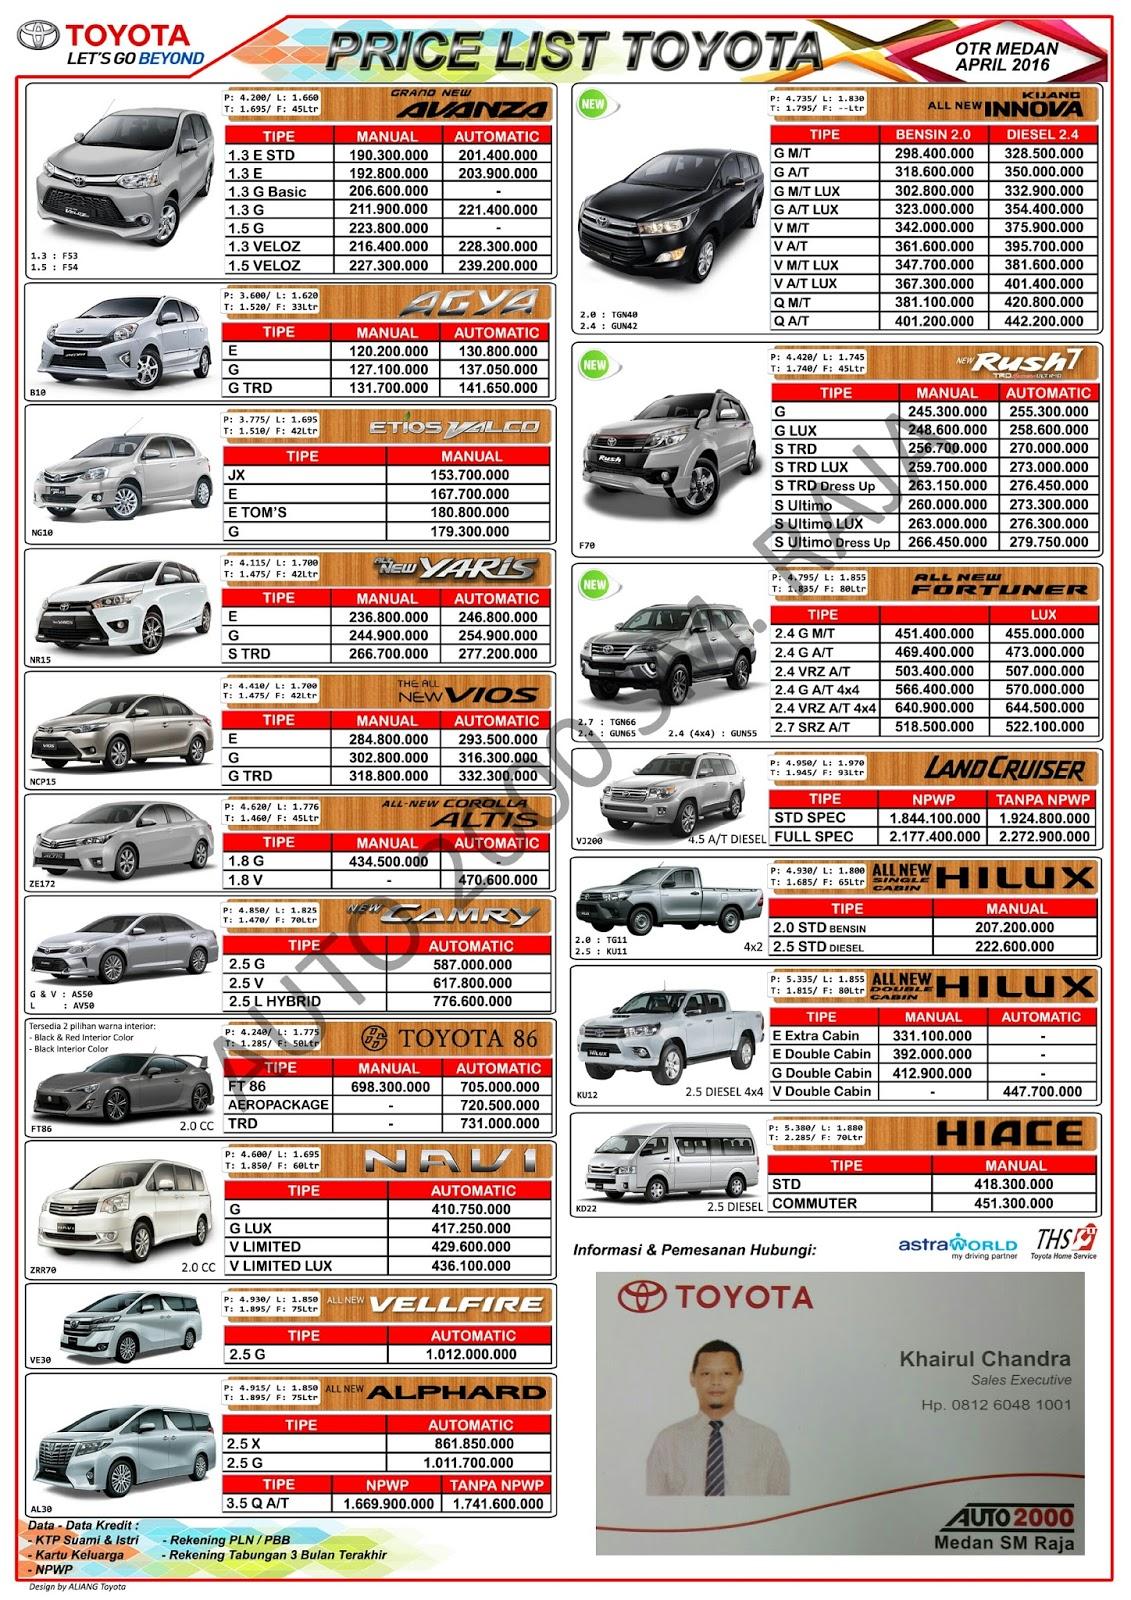 Harga Grand New Avanza Otr Medan Diskon 2018 Toyota Dan Aceh Bulan Maret 2016